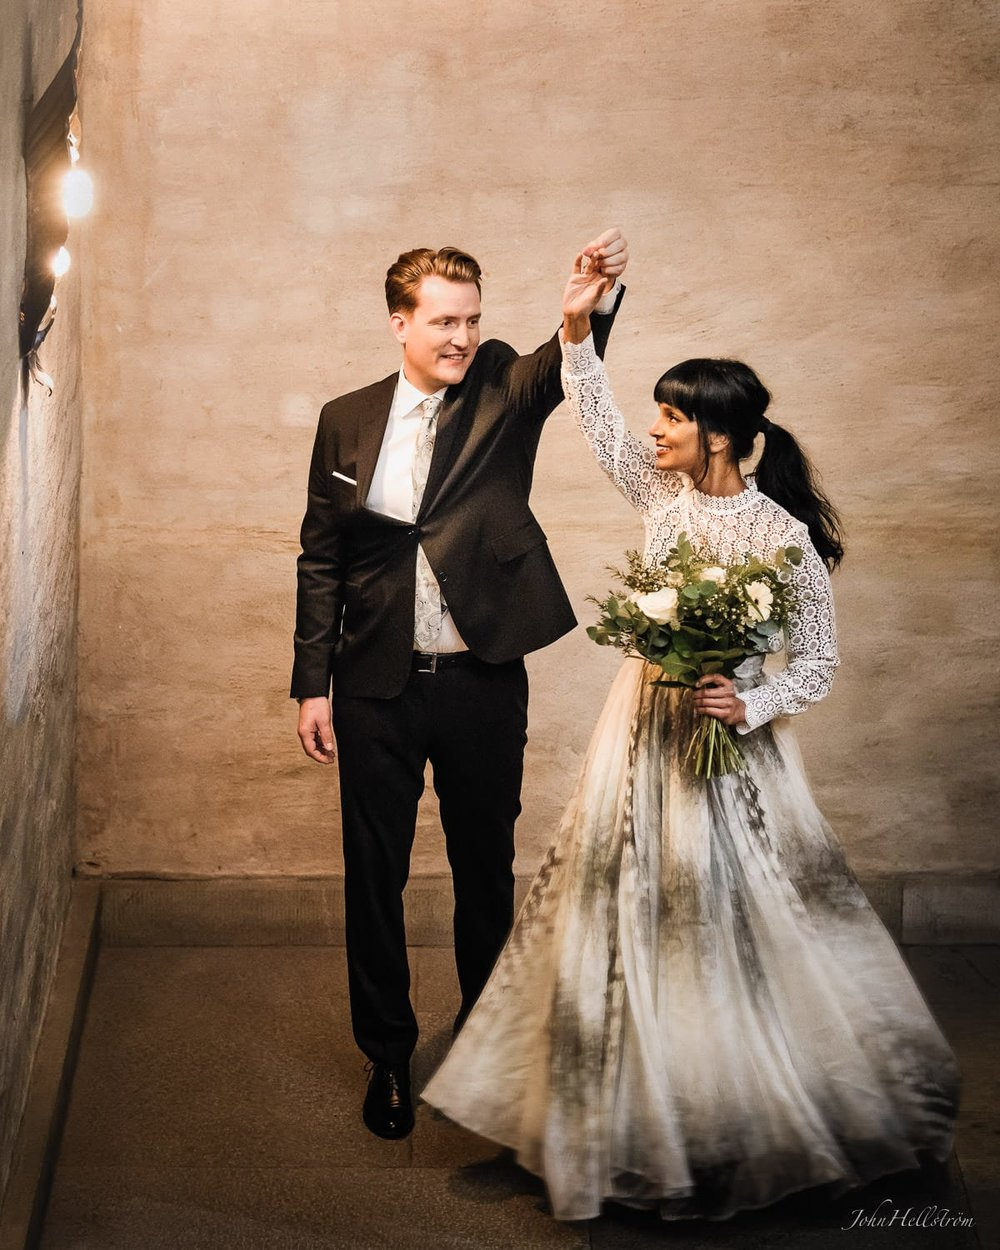 wedding-photographer-brollop-fotograf-brollopsfotograf-stockholm-grebbestad-00066.jpg